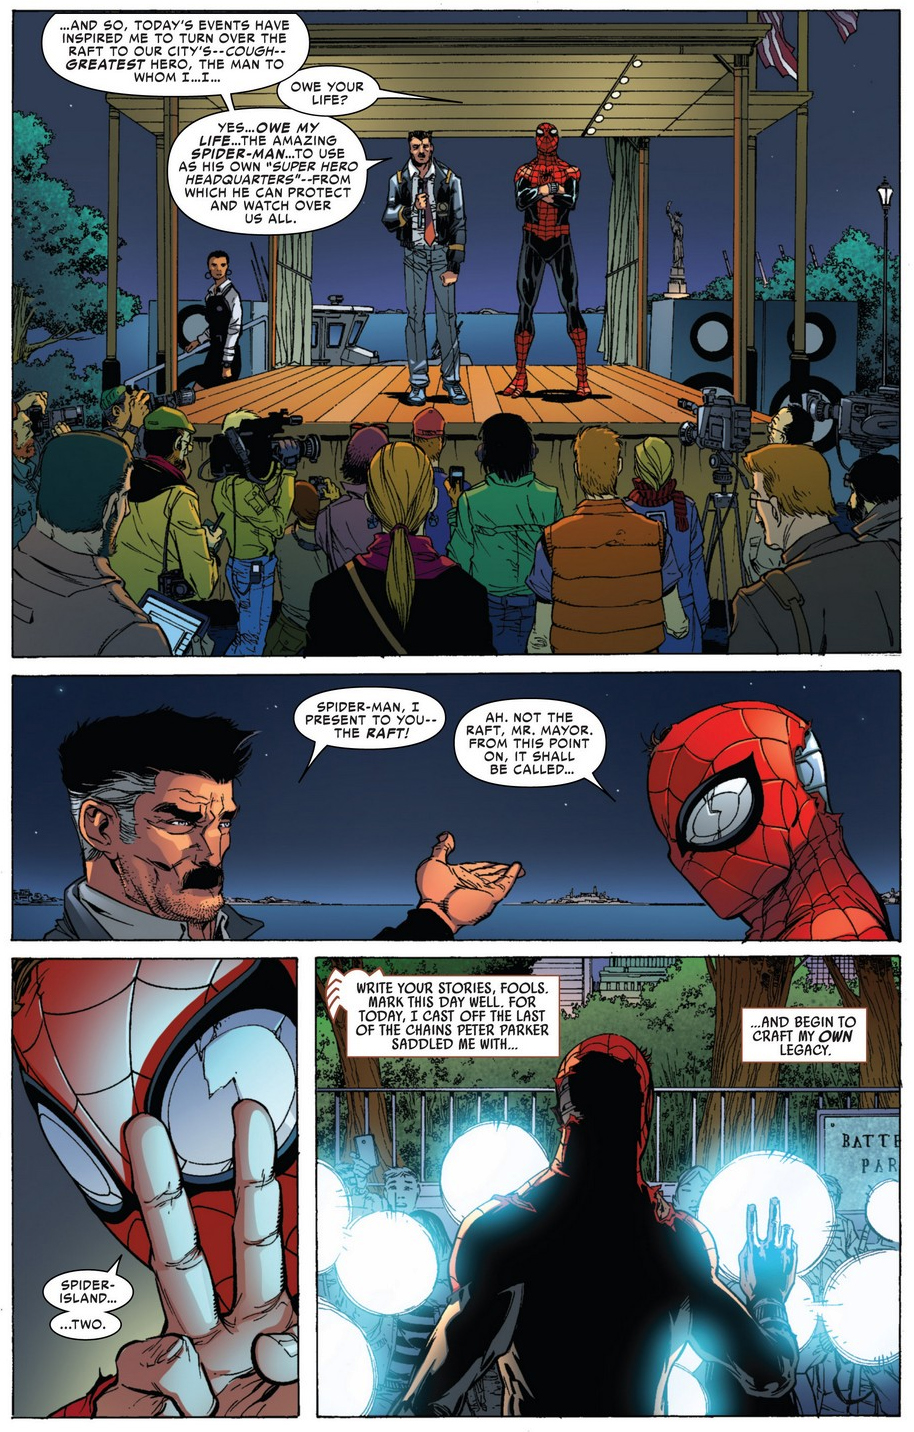 superior spider-man blackmails jonah jameson